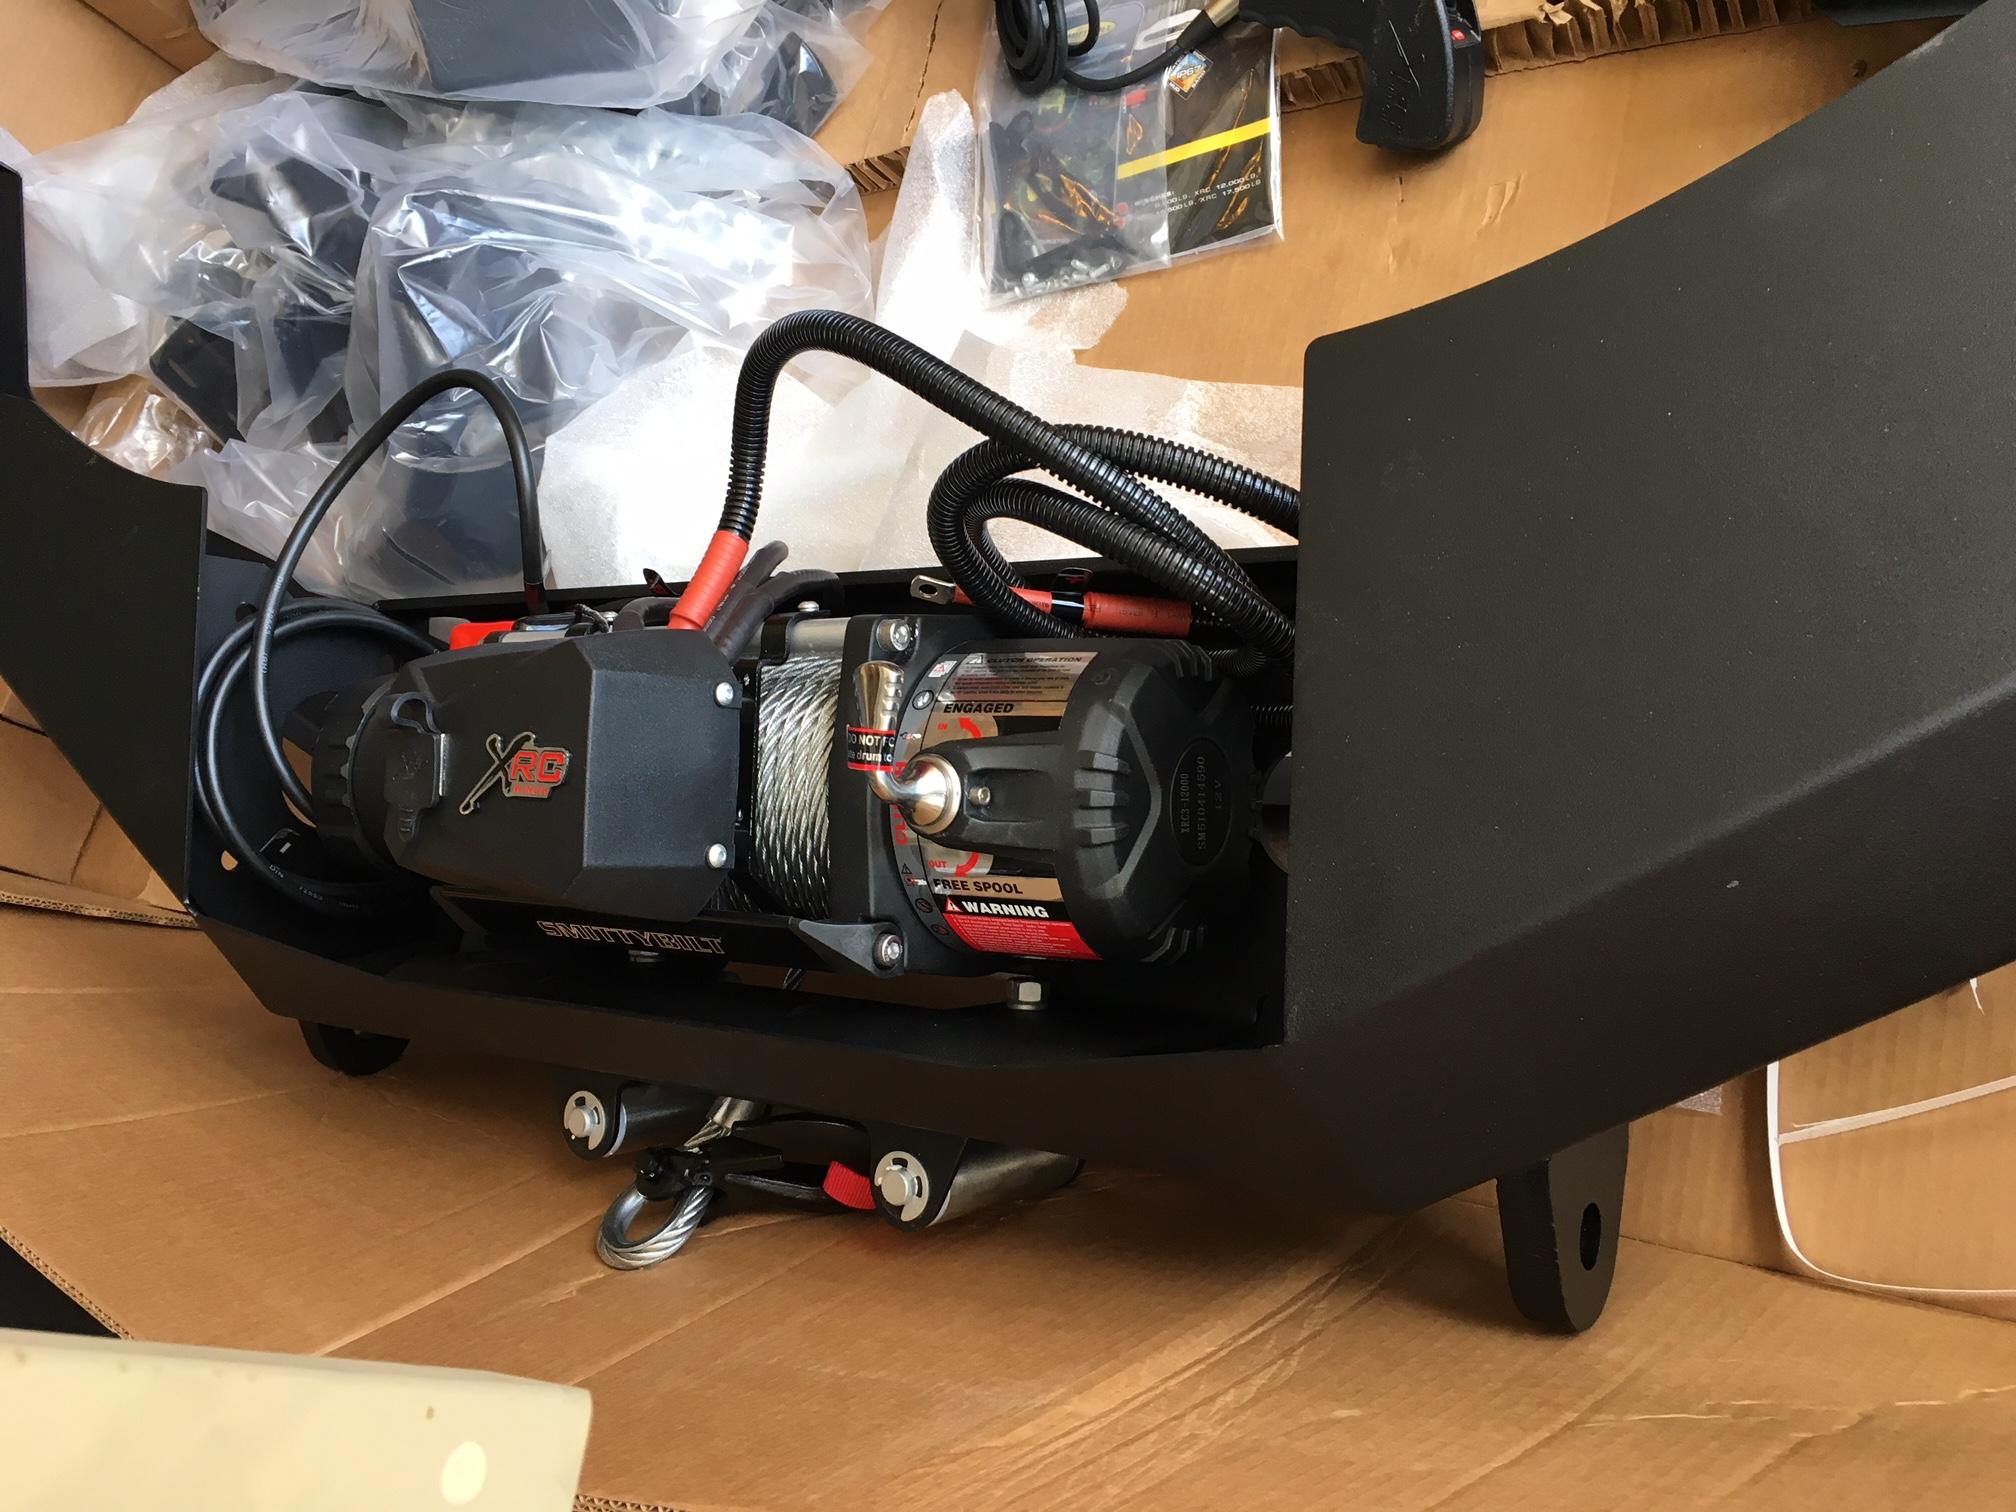 hight resolution of  warn winch bumper installed img 9429 jpg